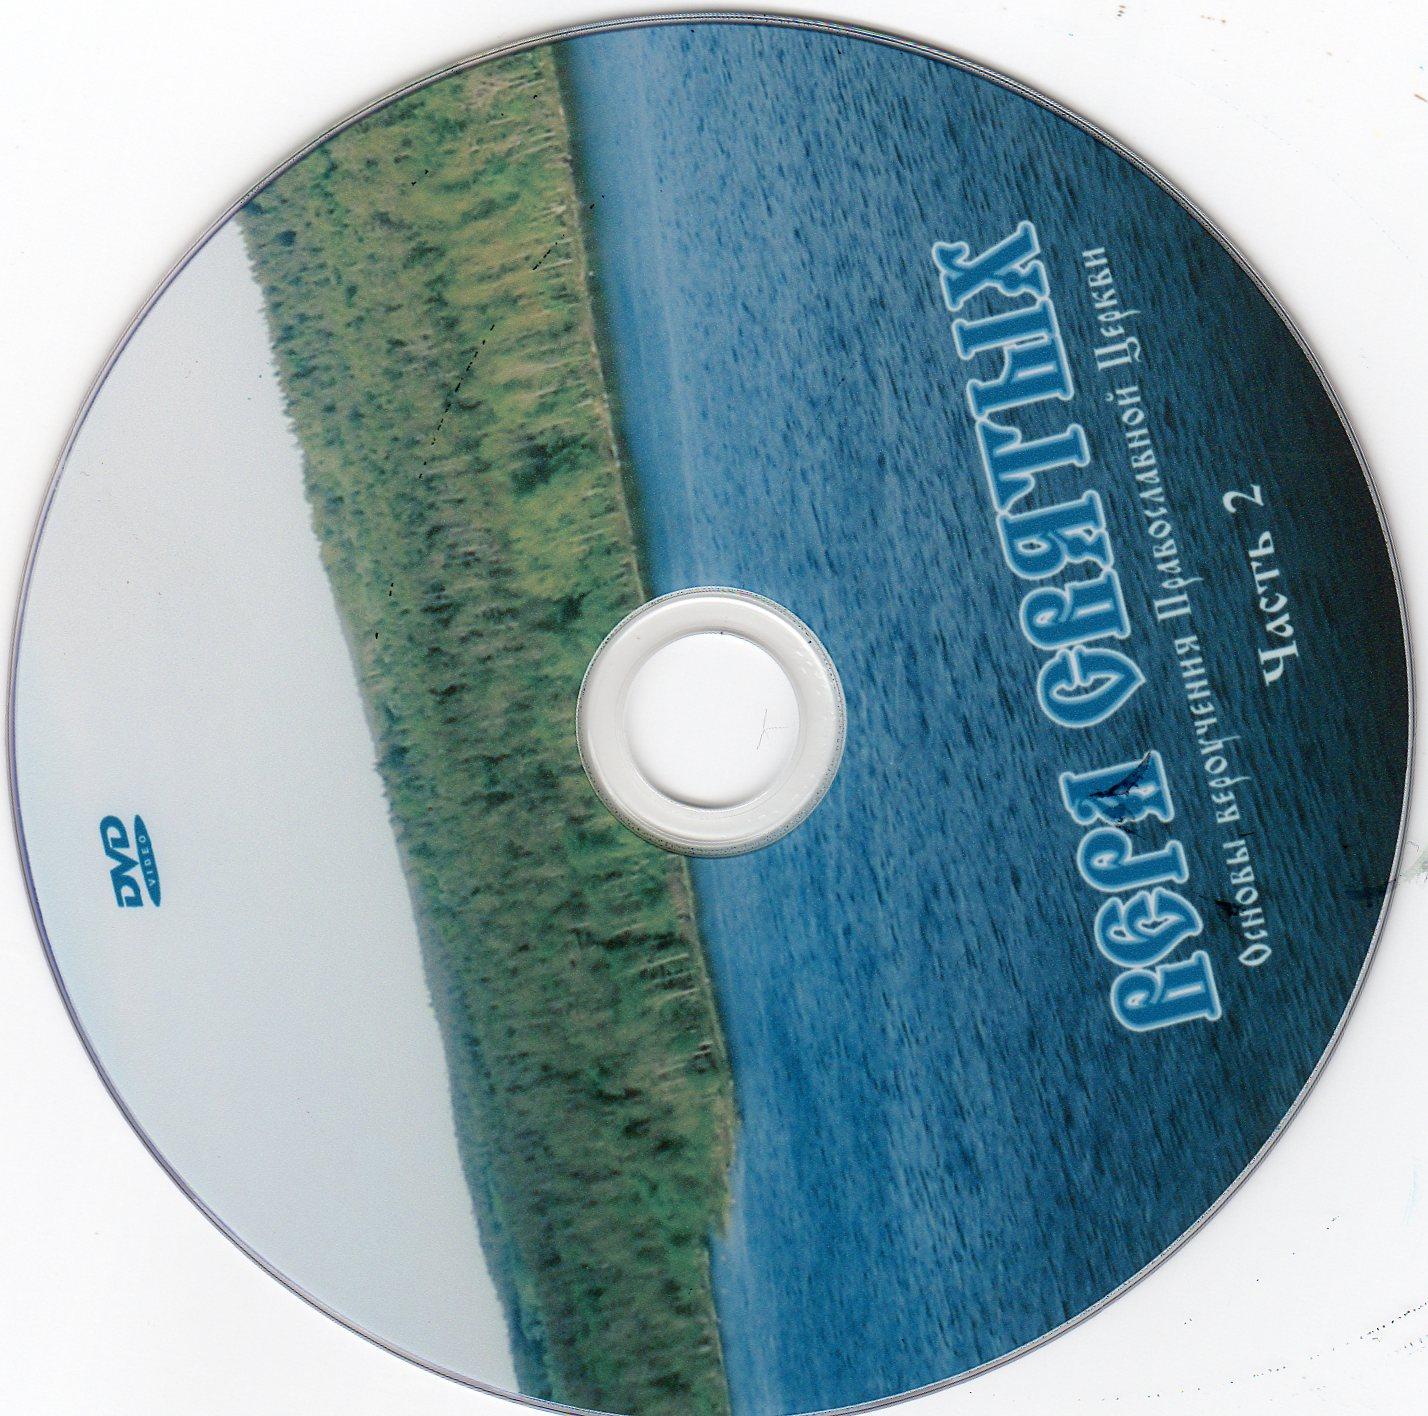 Вера святых диск_2.jpg